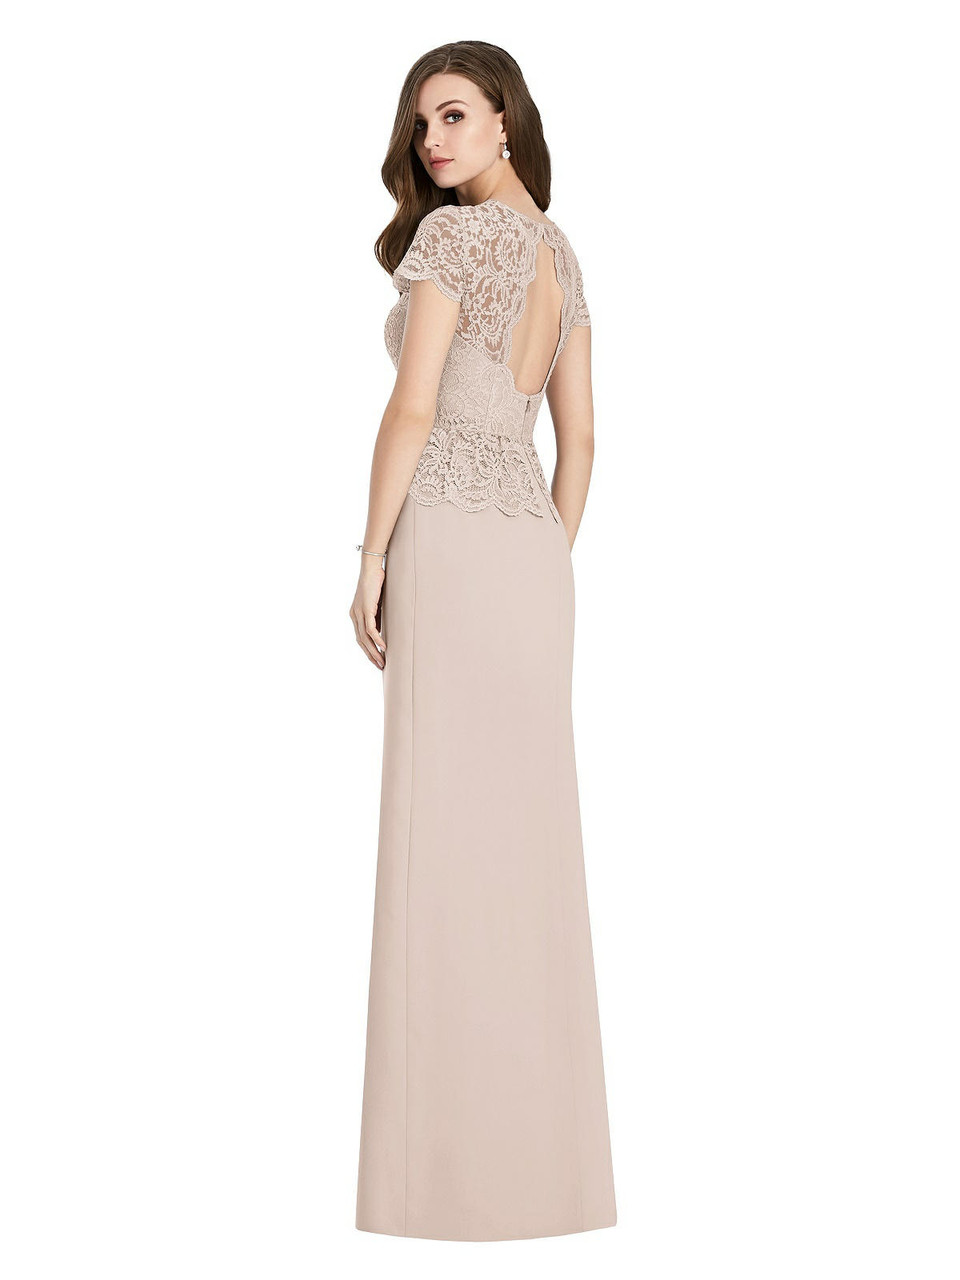 Jenny Packham Style JP1012  |  Marquis Lace & Crepe - Short Sleeve Open-Back Lace Peplum Maxi Dress